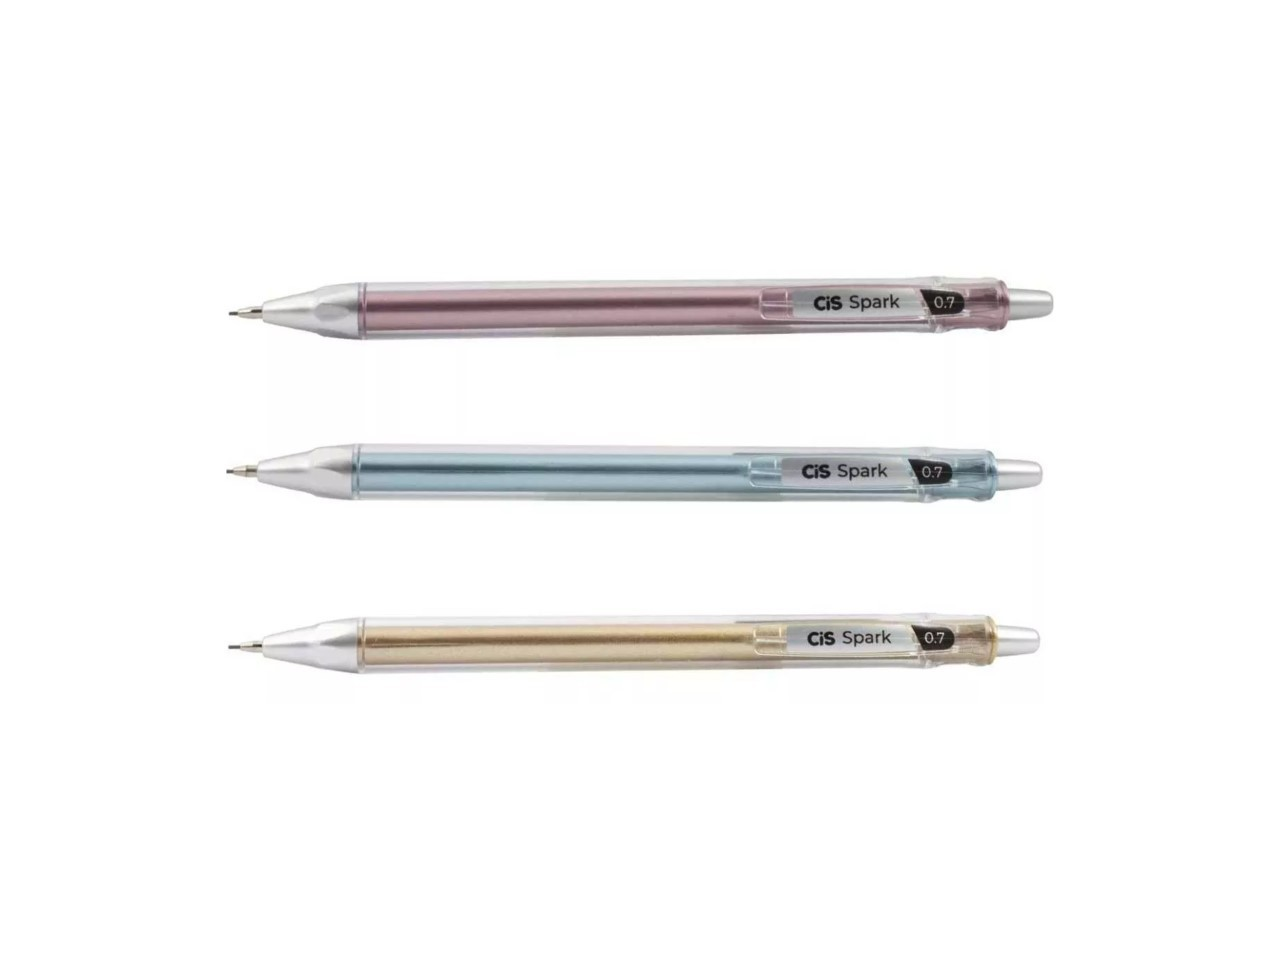 Lapiseira CIS Spark 0,7mm Metálica - Rosa